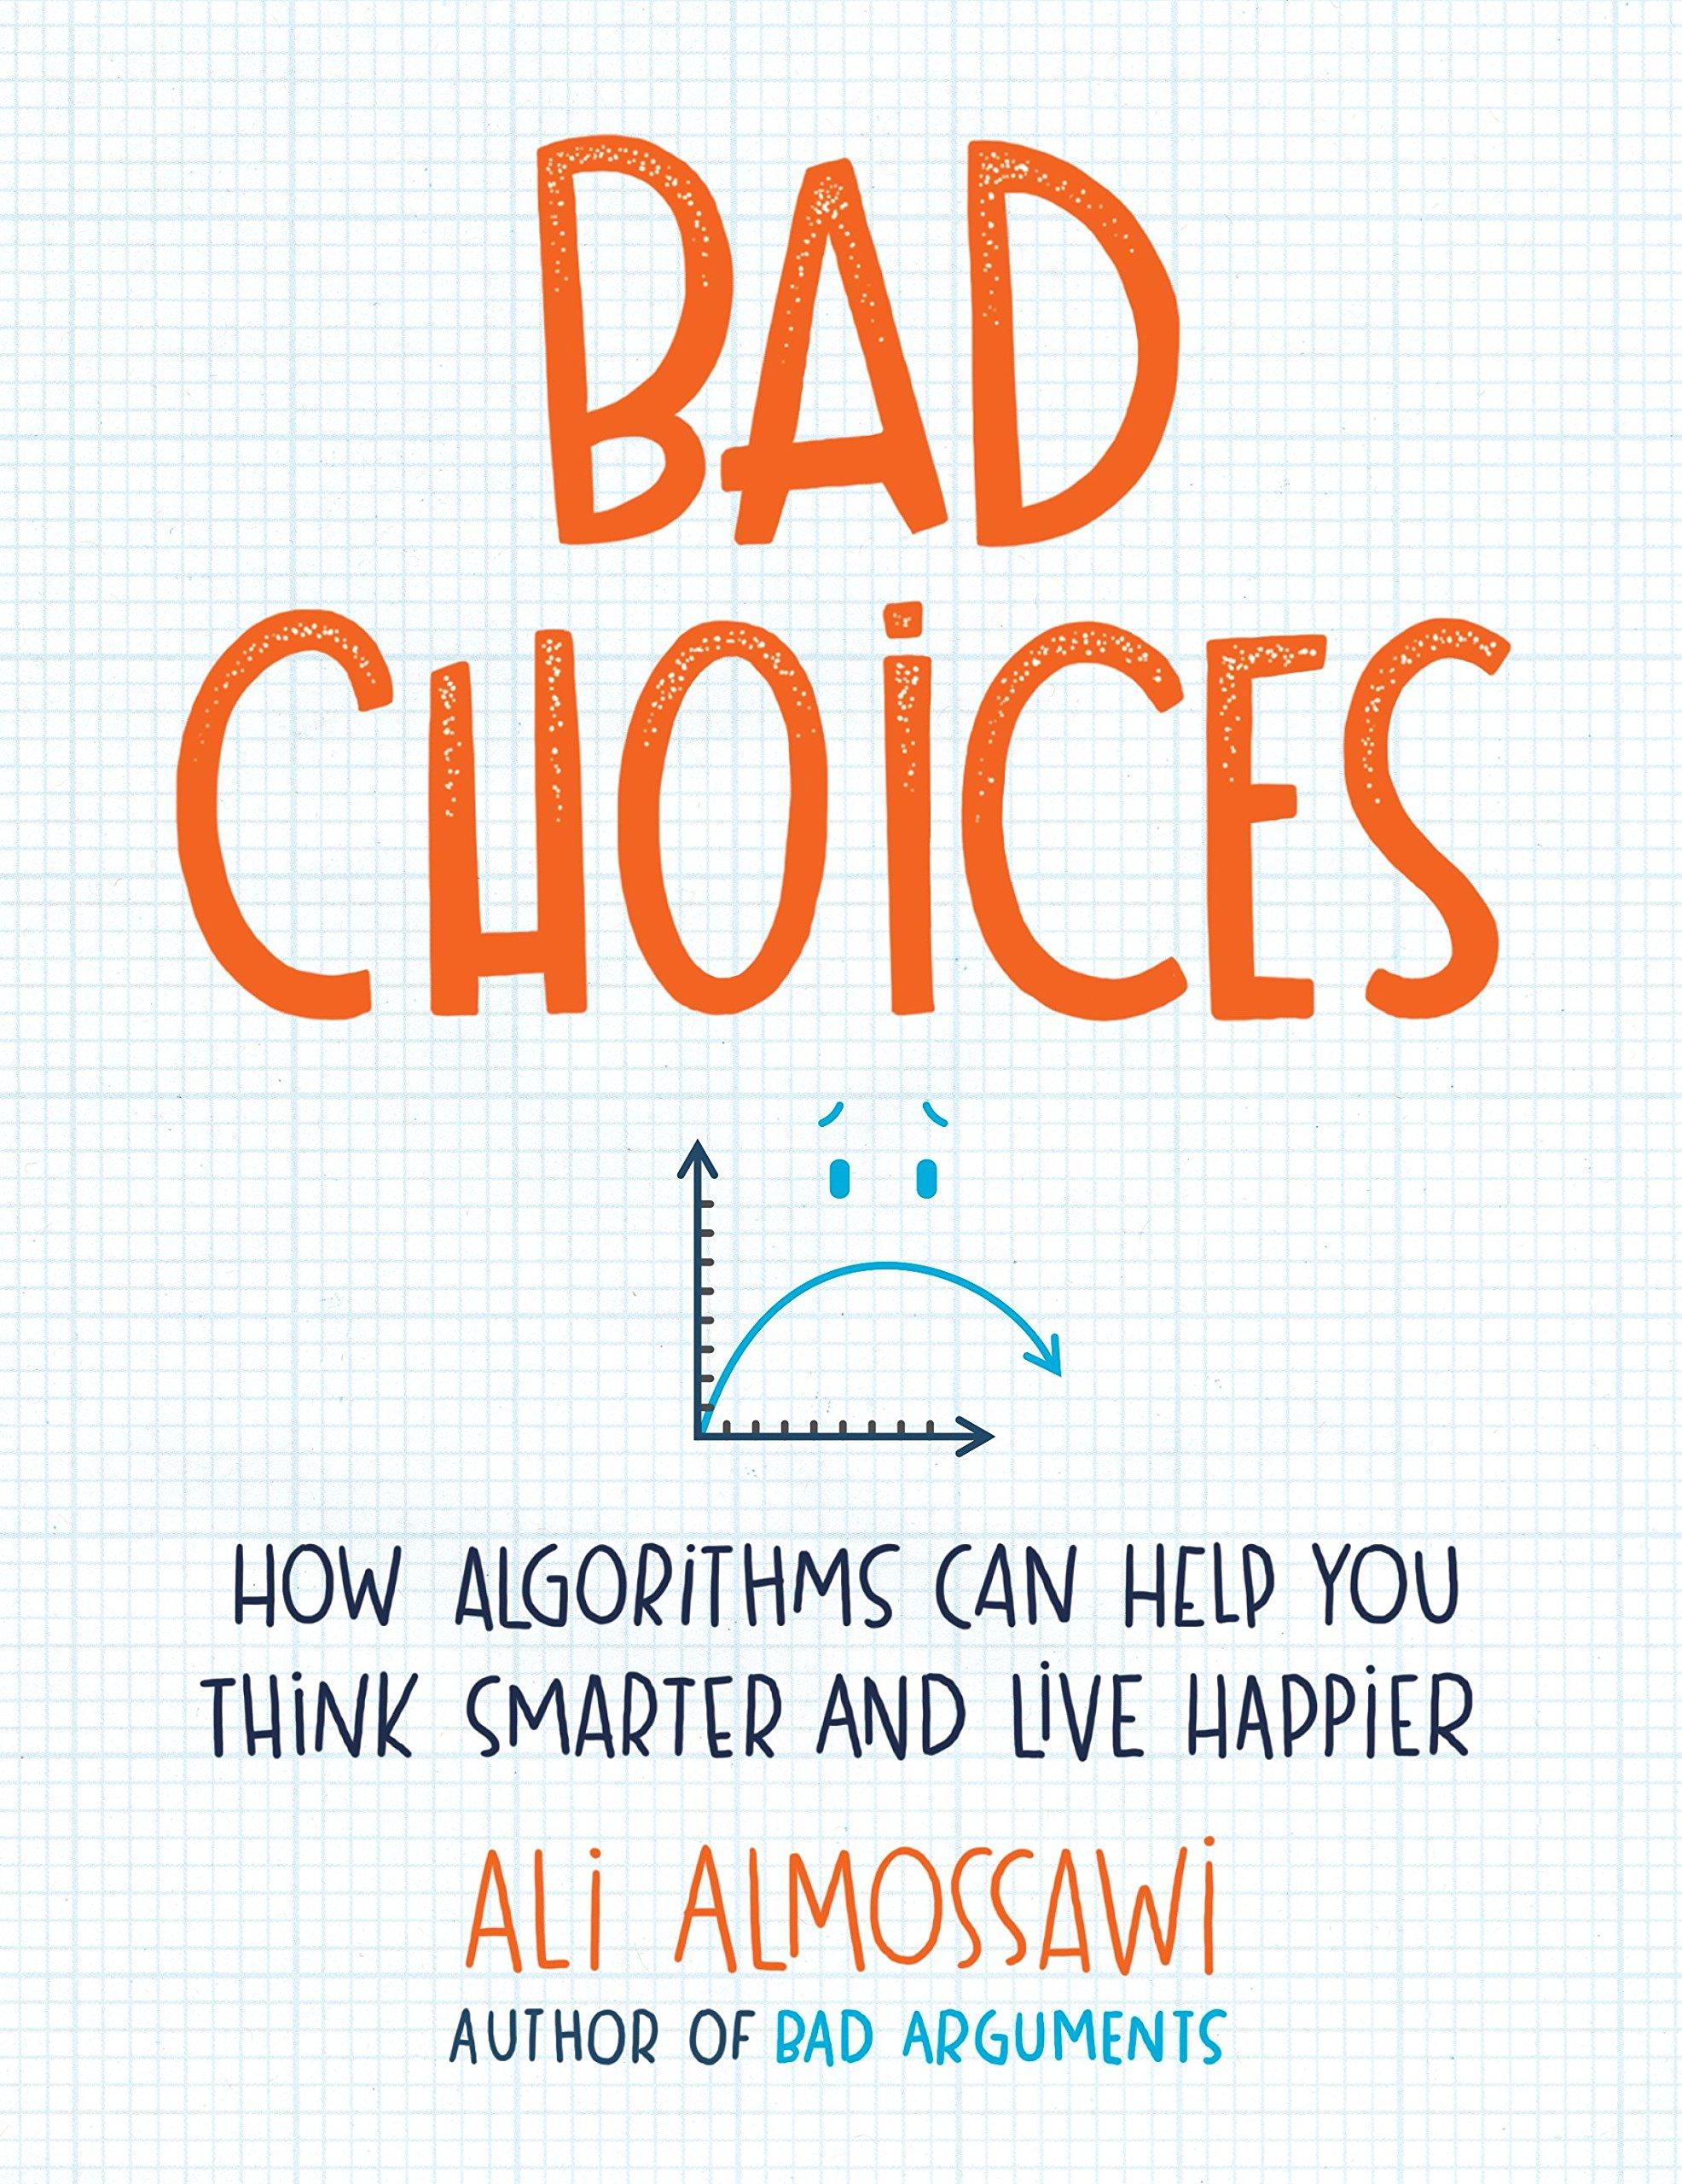 Bad Choices Algorithms Smarter Happier product image